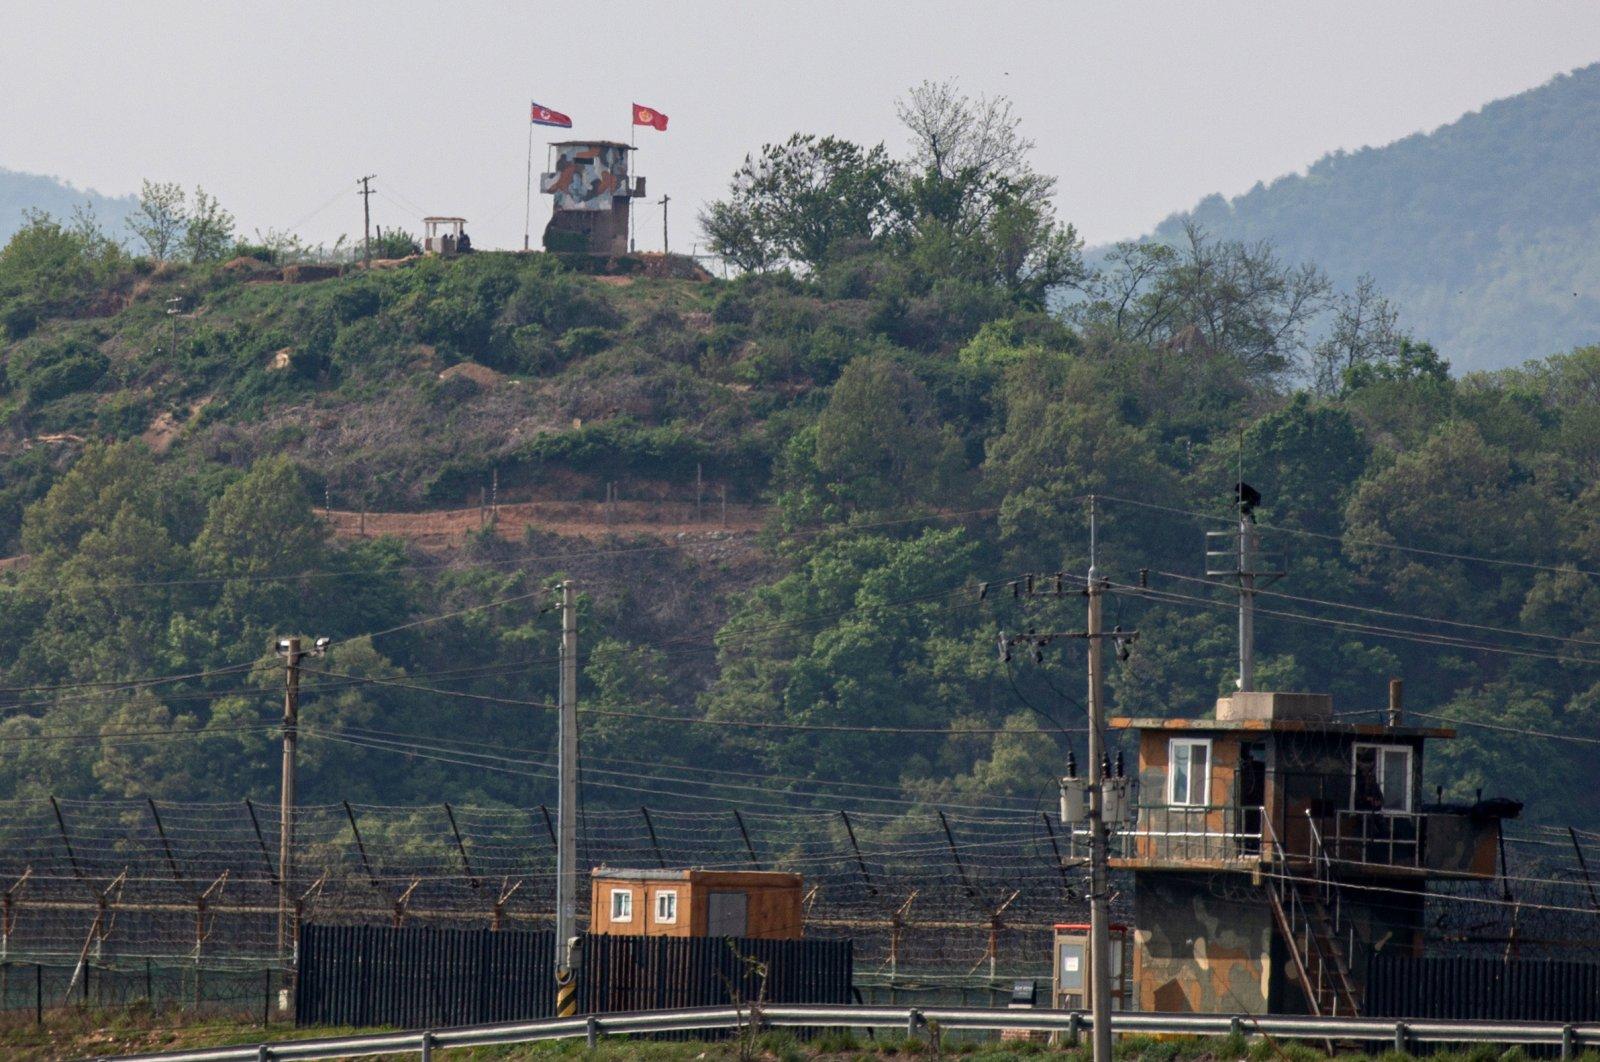 A North Koren frontier post (top) and a South Korean frontier post (front) face each other across the inter-Korean border near the city of Paju, Gyeonggi-do, South Korea, May 3 2020. (EPA Photo)